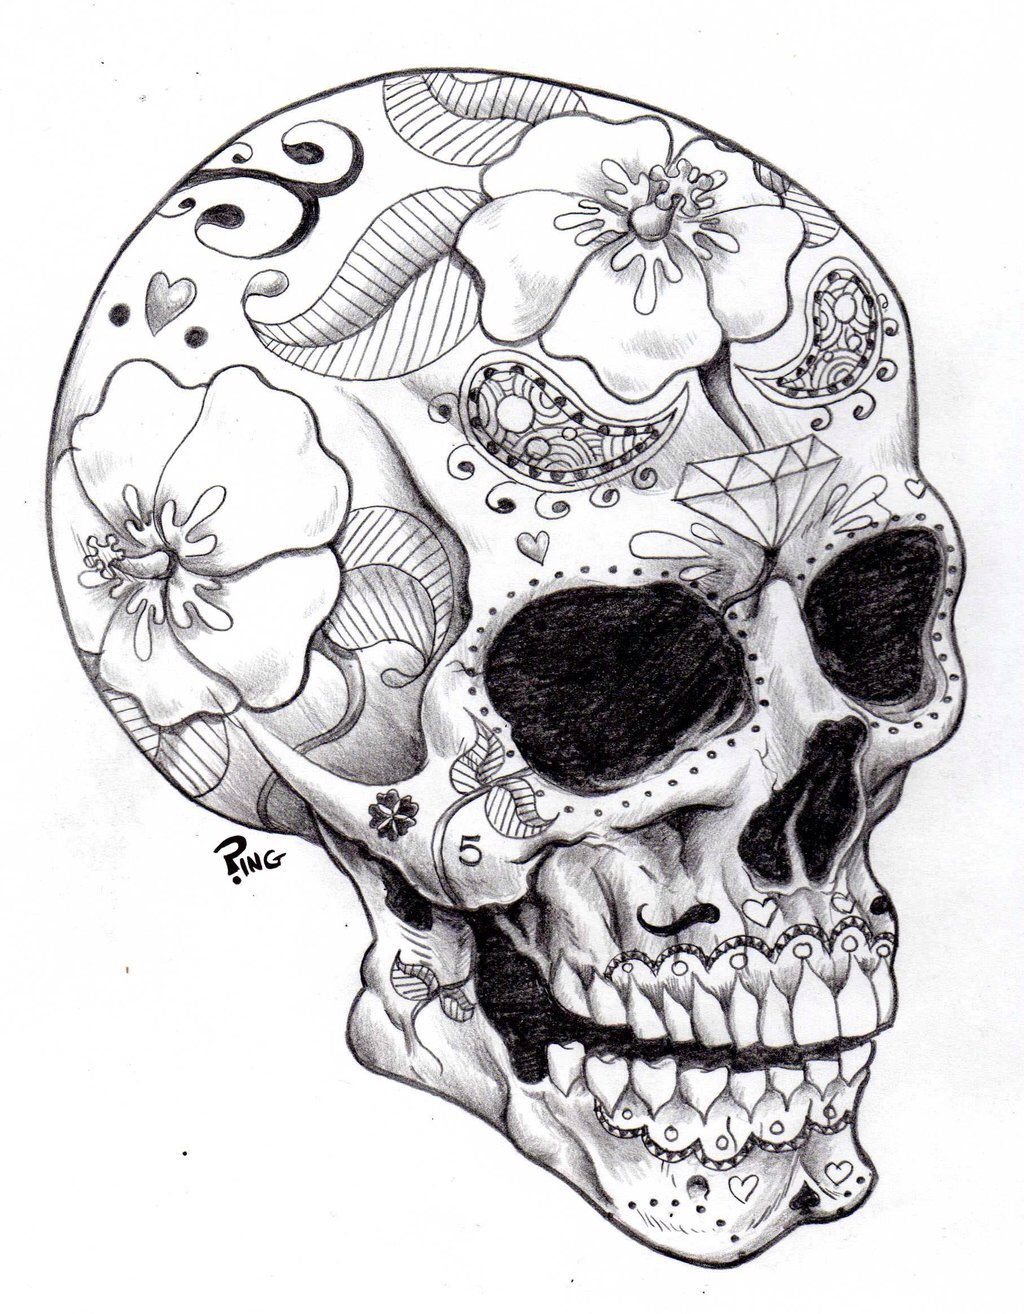 Pin By Deanna Lea On Tattoos Skull Coloring Pages Skull Art Skull